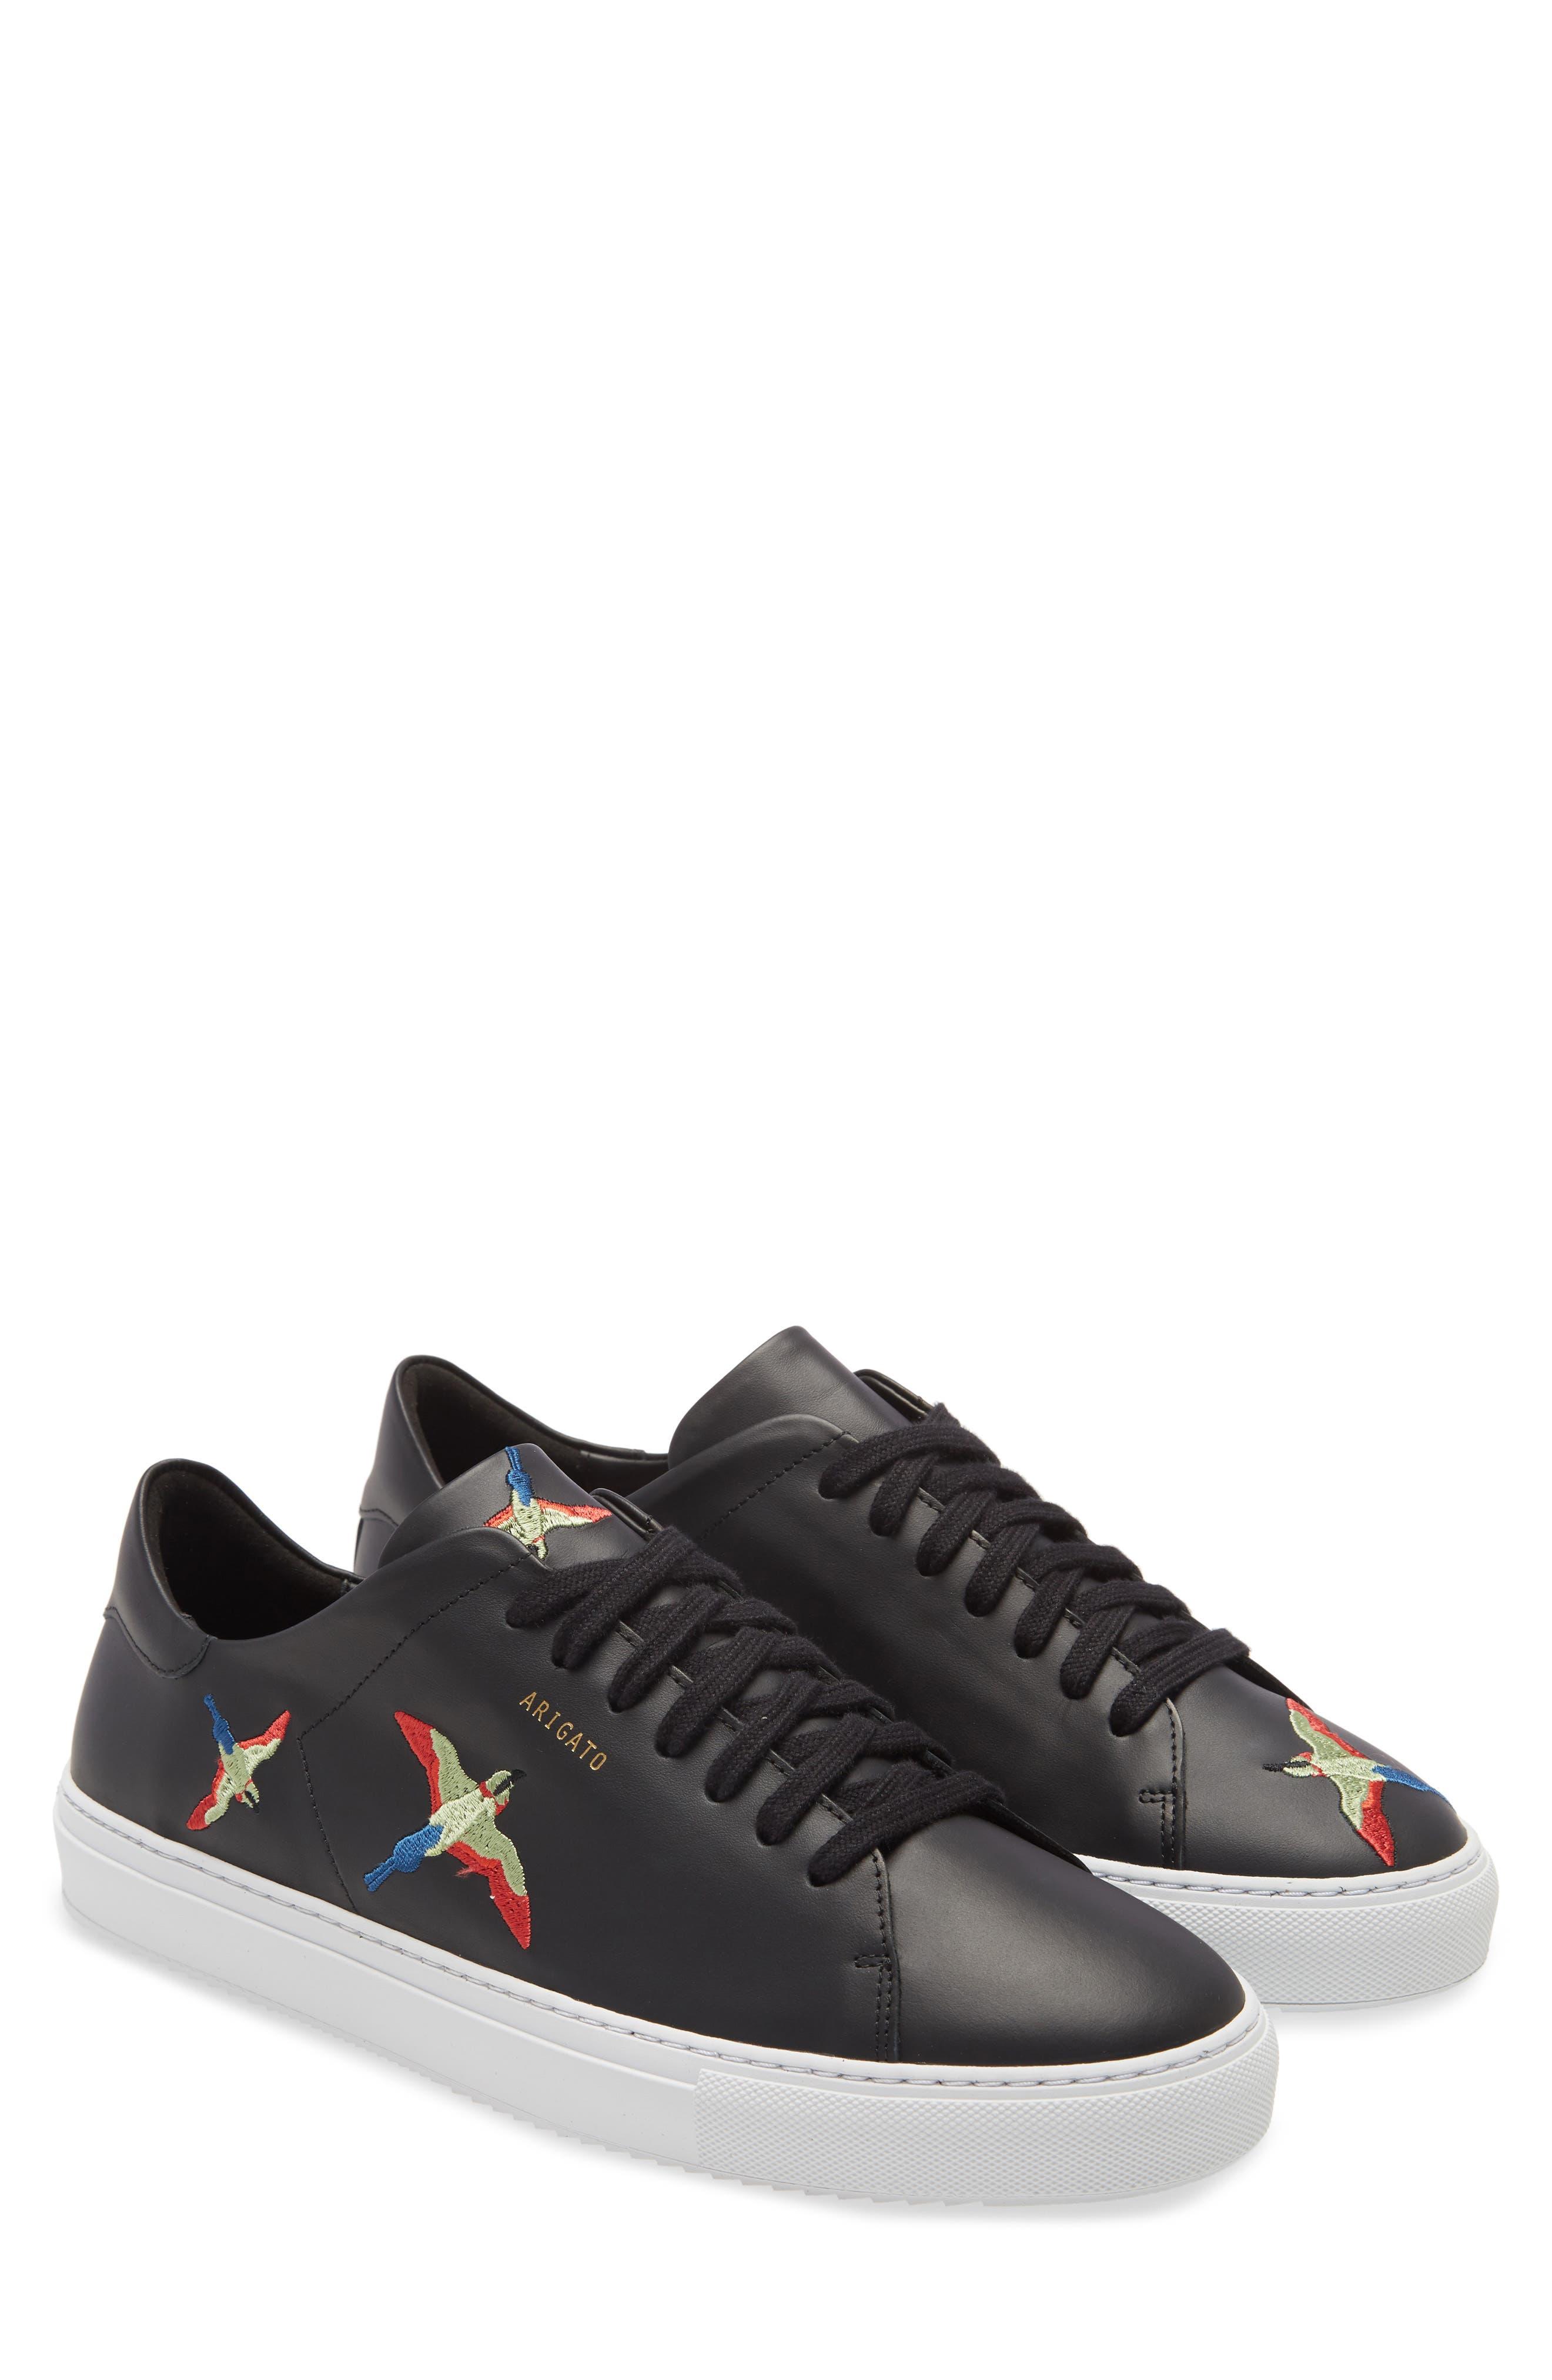 Men's Axel Arigato Shoes | Nordstrom